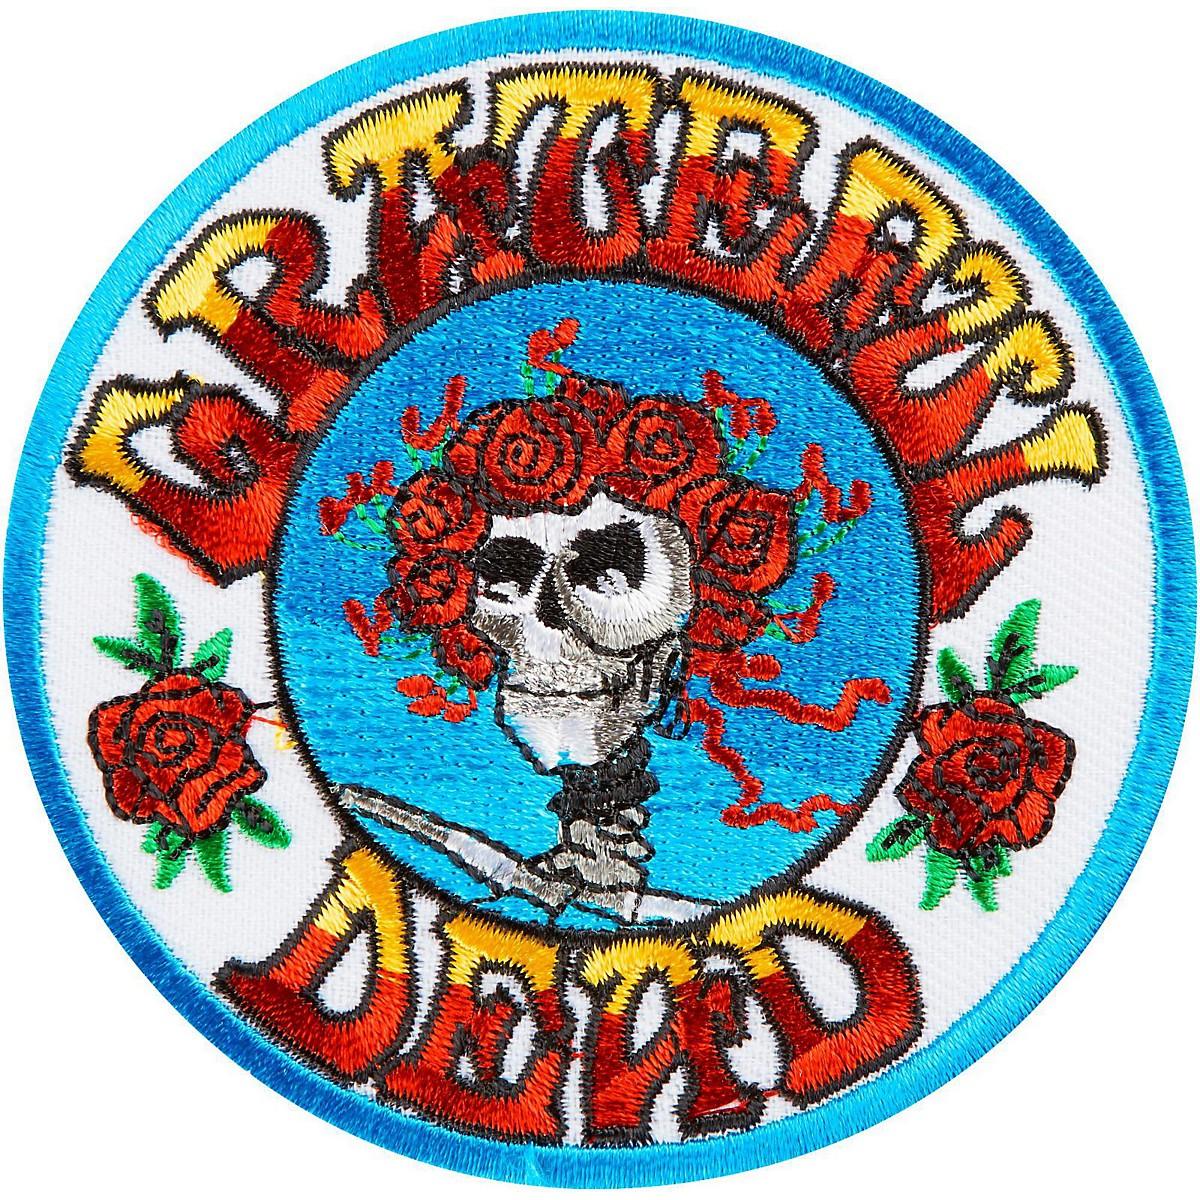 C&D Visionary Grateful Dead Skull & Roses Patch